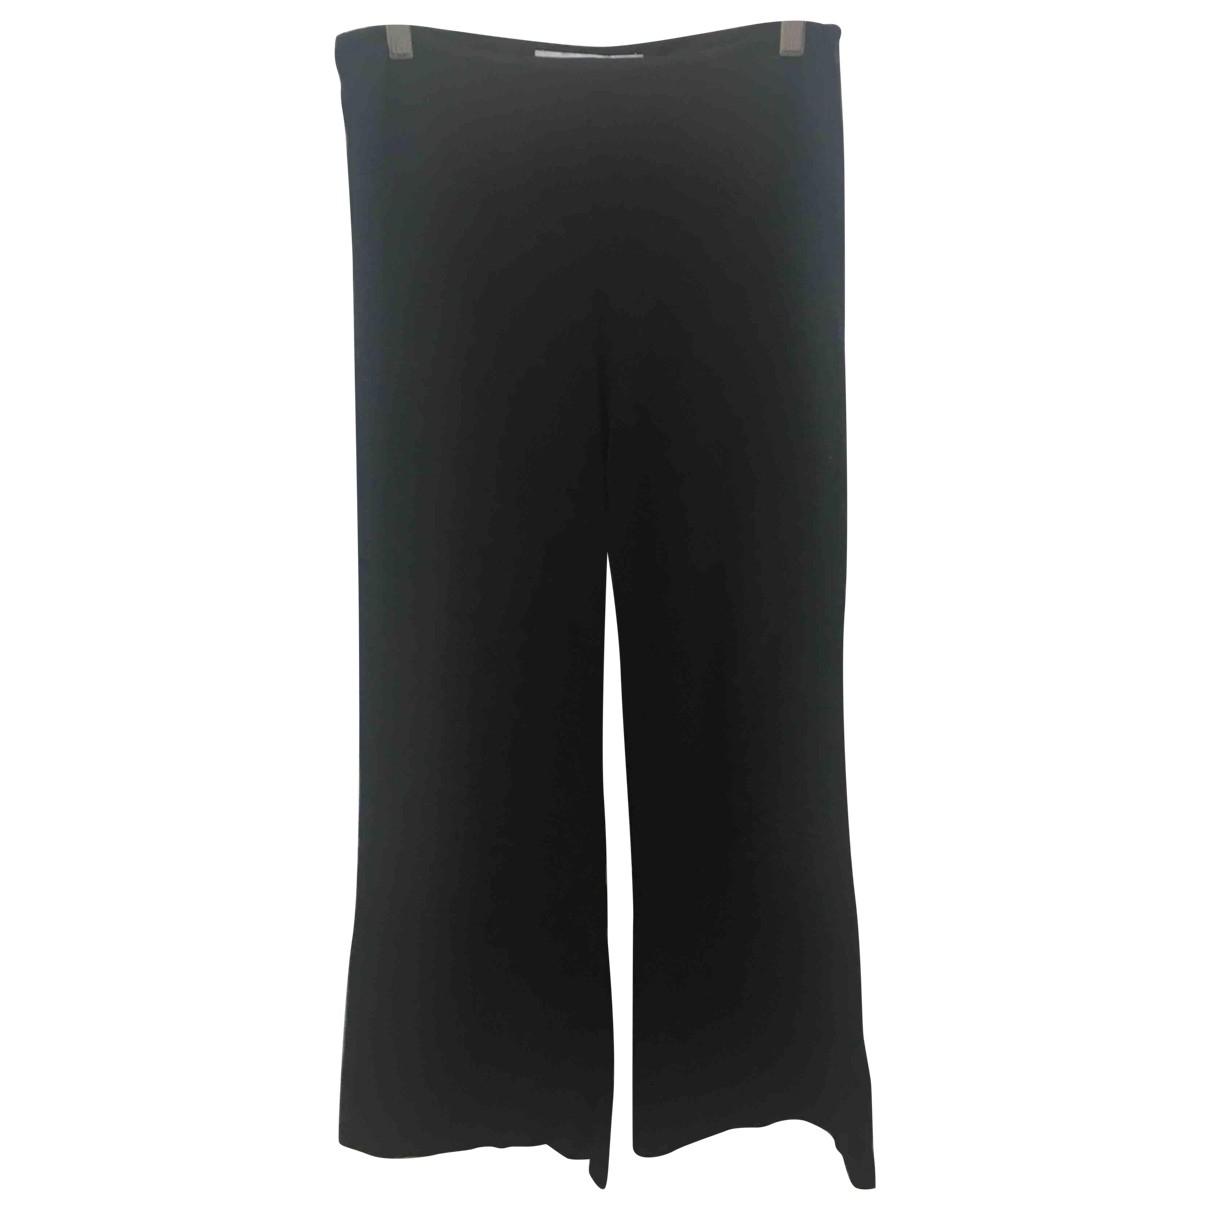 & Stories \N Black Trousers for Women 34 FR